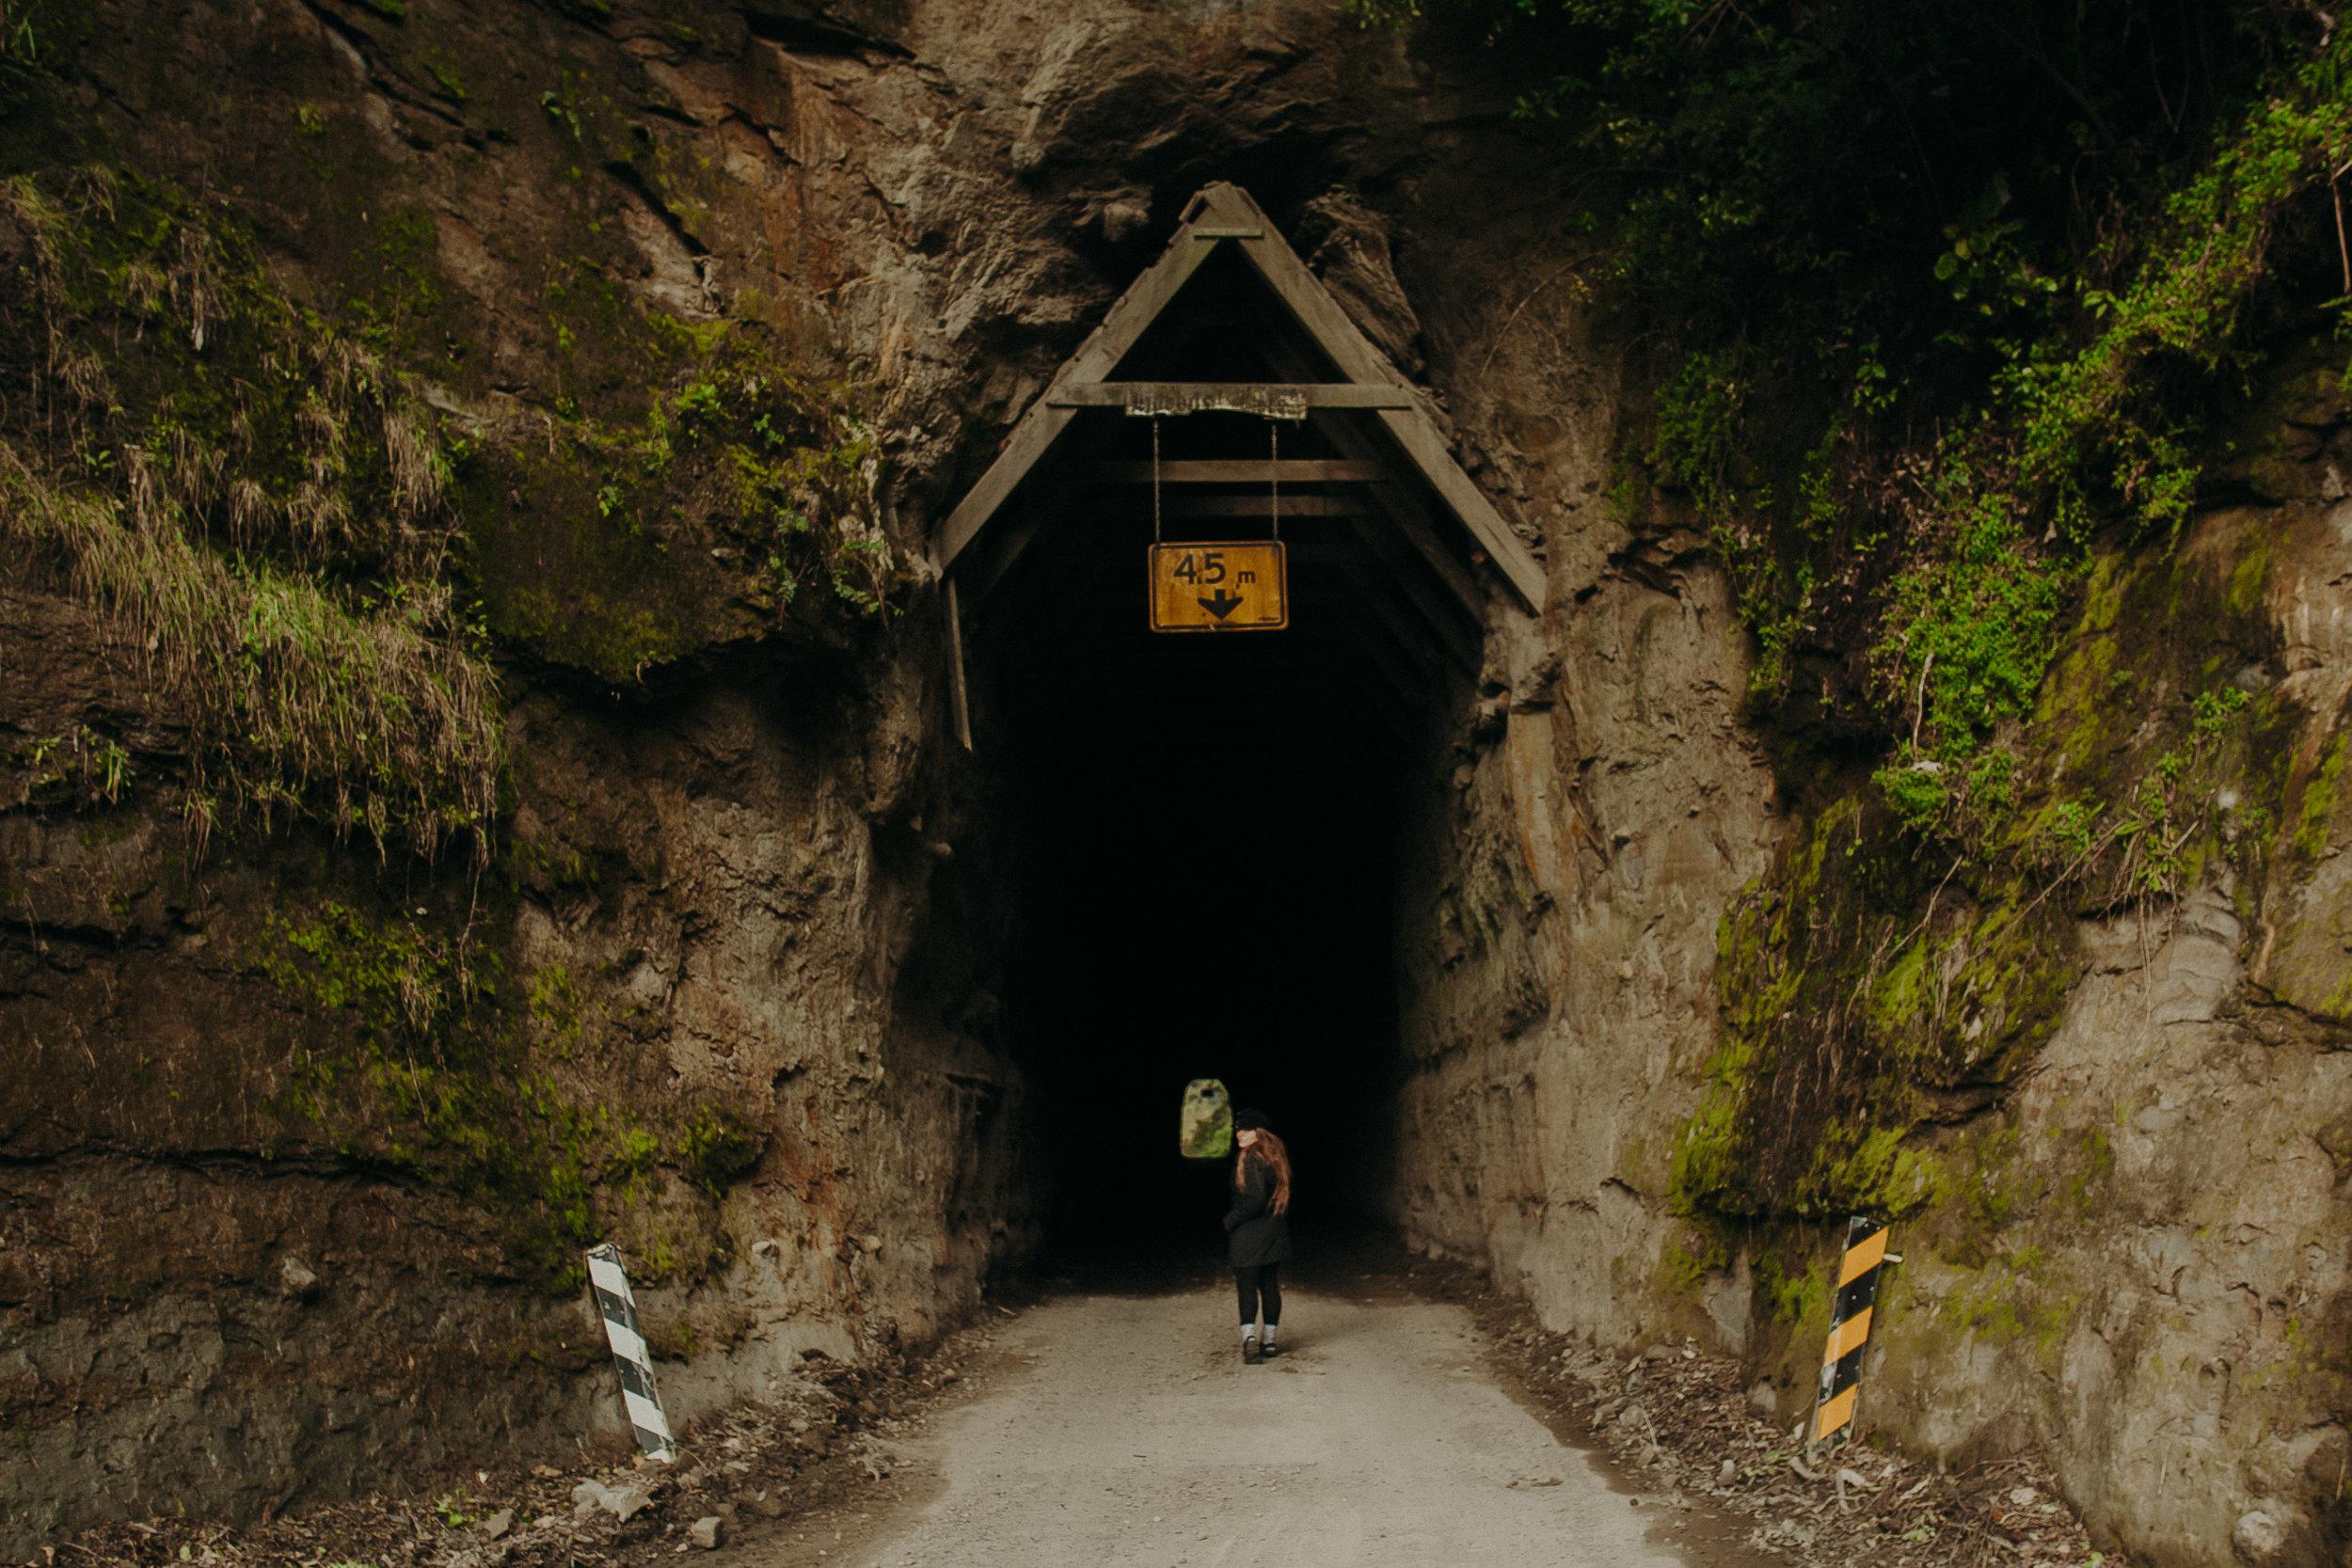 Forgotten-World-Highway-New-Zealand-25.jpg